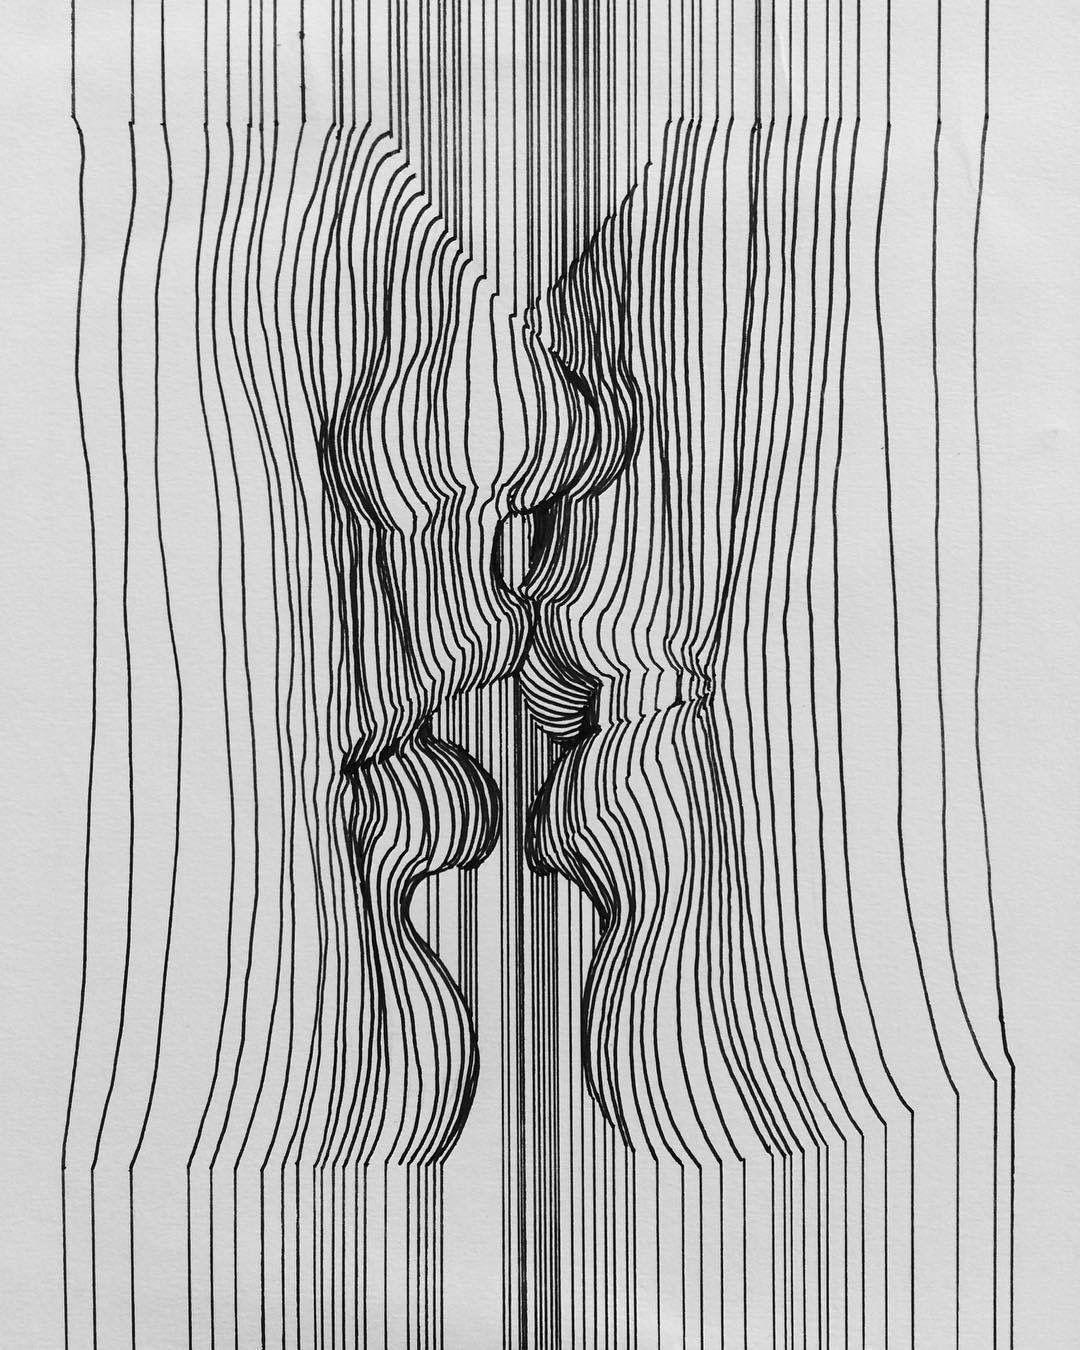 Dibujos A Linea Trabajos De Arte Dibujos Significativos Arte Lineas